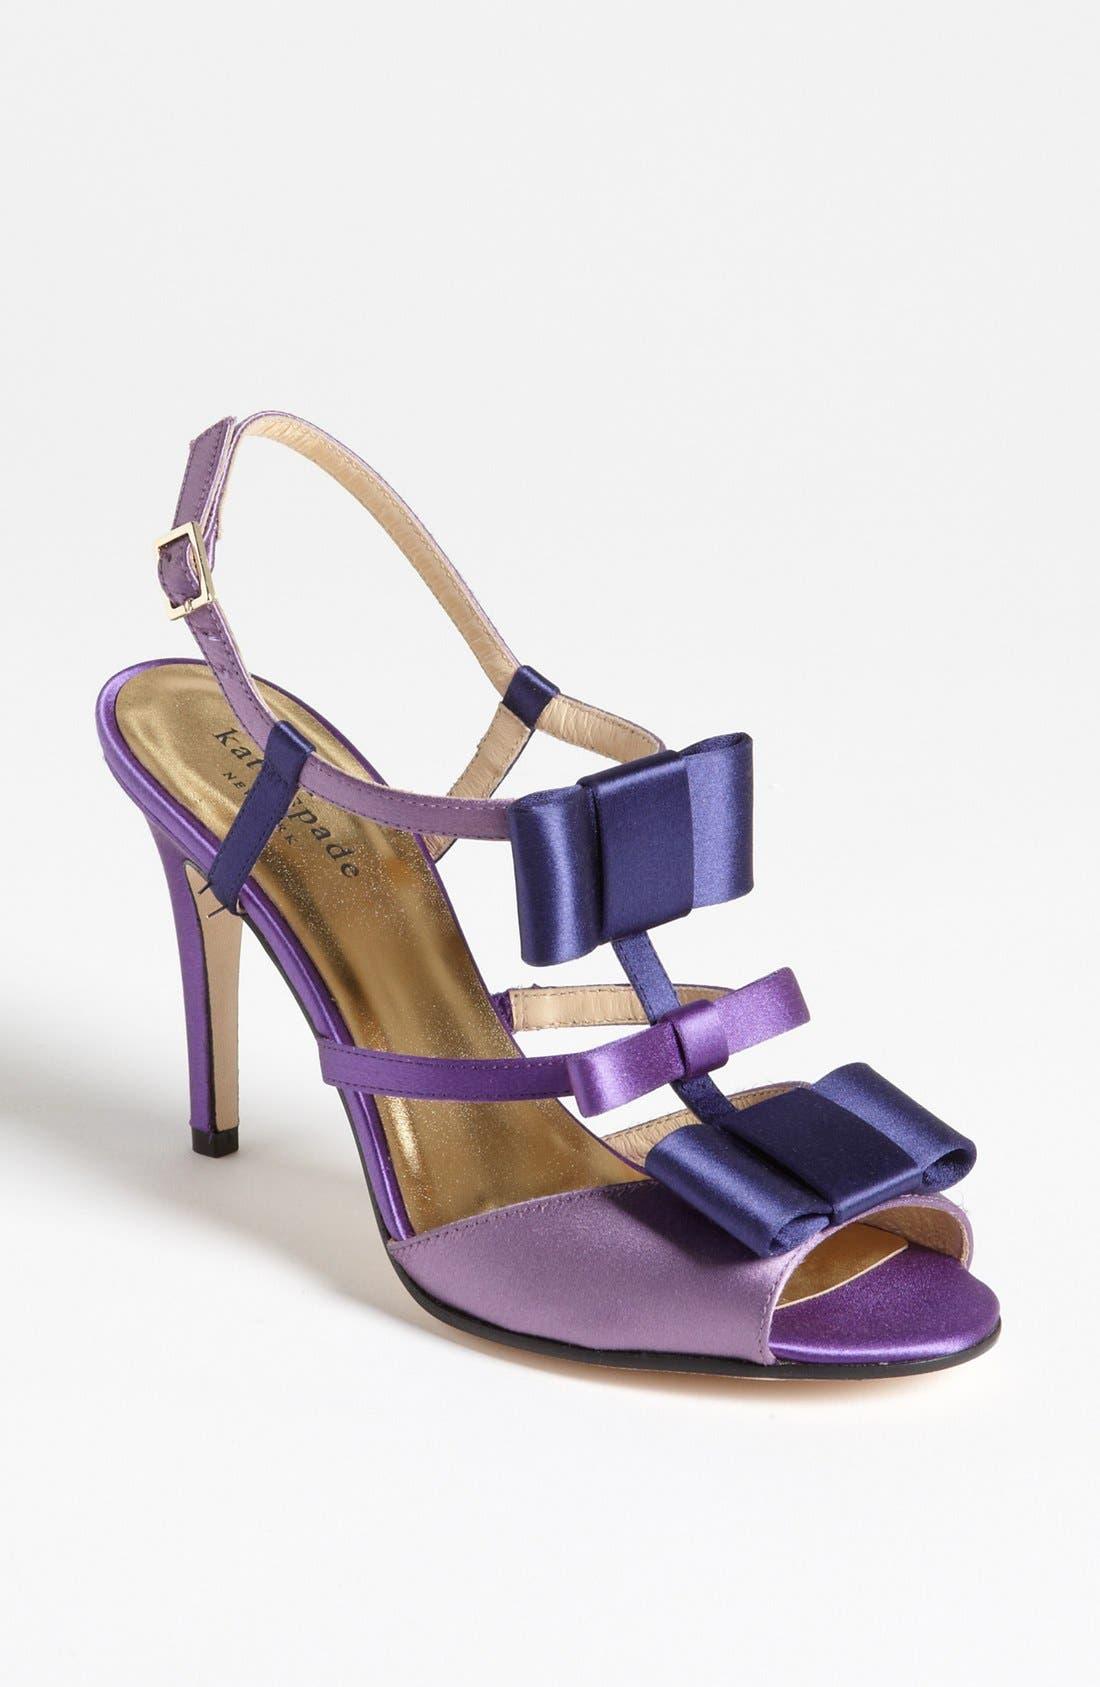 Main Image - kate spade new york 'ivy' sandal